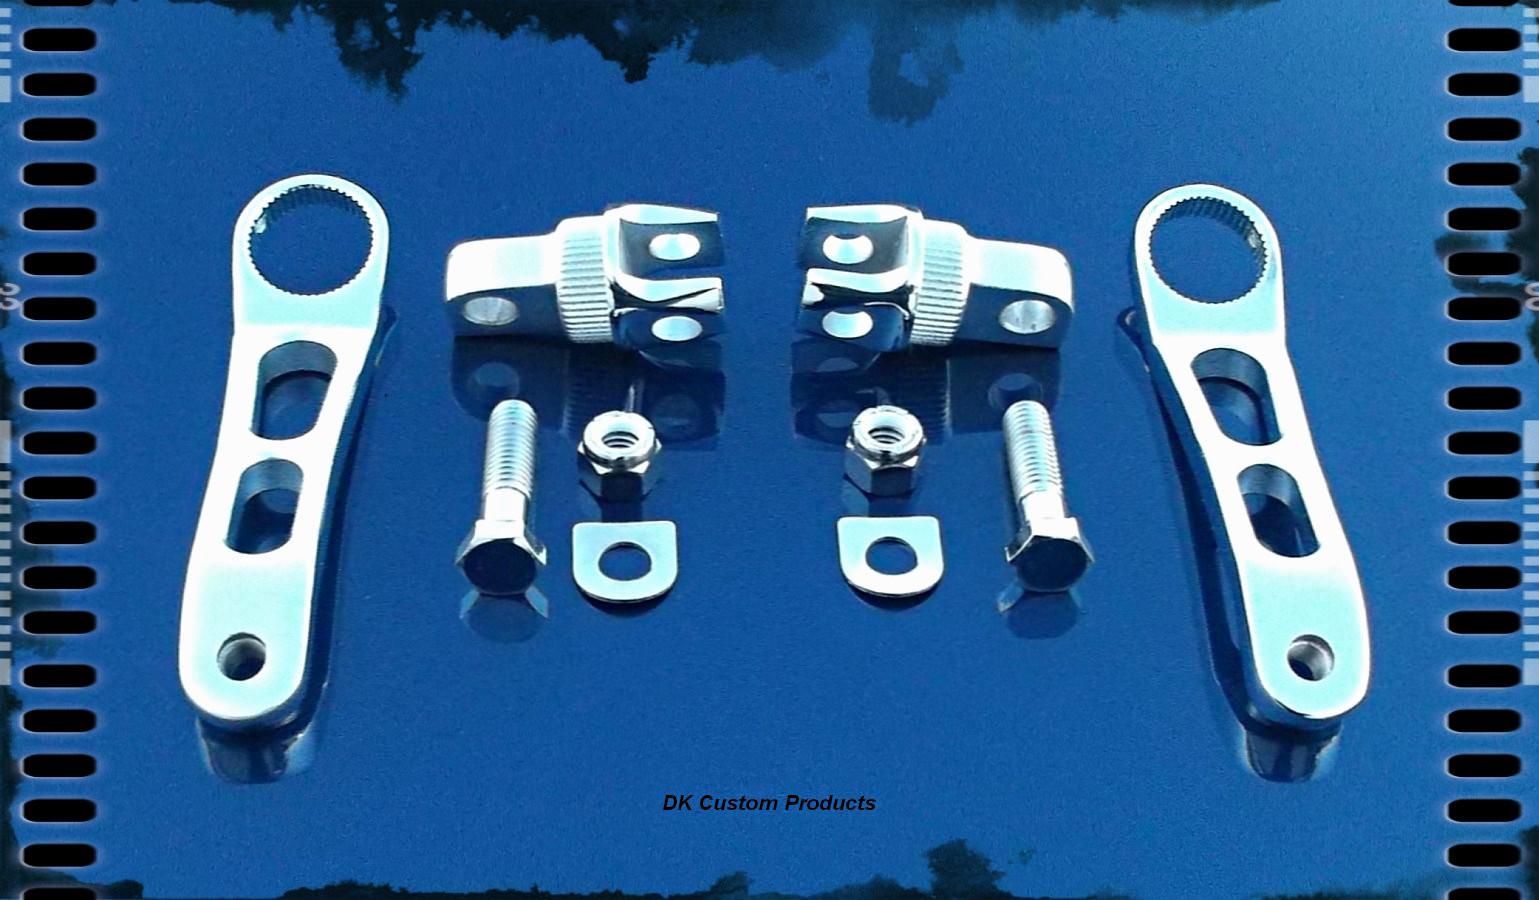 DK Cuatom Chrome Heel Rest Bracket & Arm Kit HARLEY DAVIDSON DK Custom Sportster Dyna Softail Forward Controls Highway Foot Peg Comfort